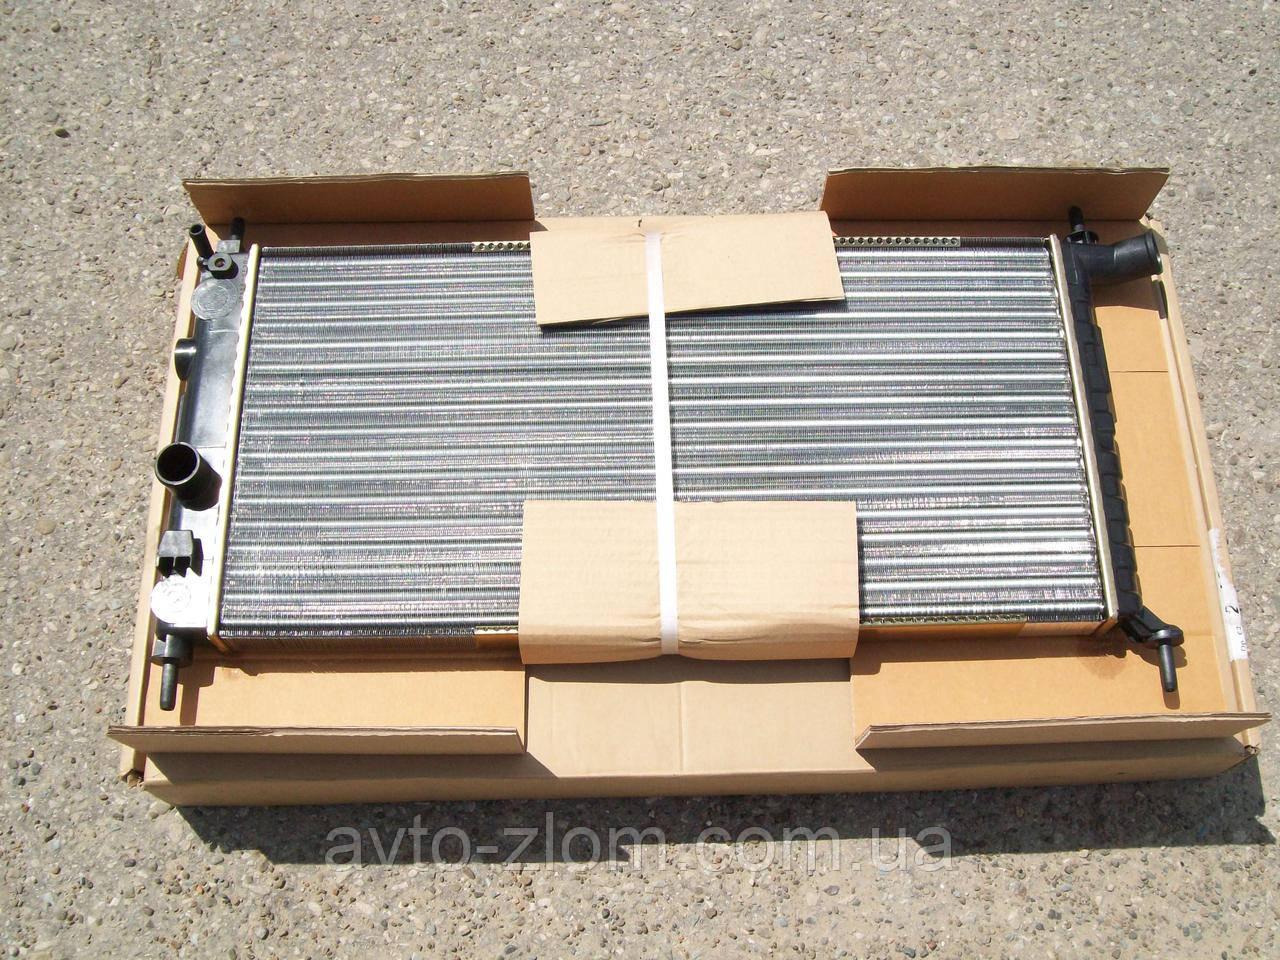 Радиатор Opel Kadett, Опель Кадетт 1,6-1,6D-1.8-2.0.